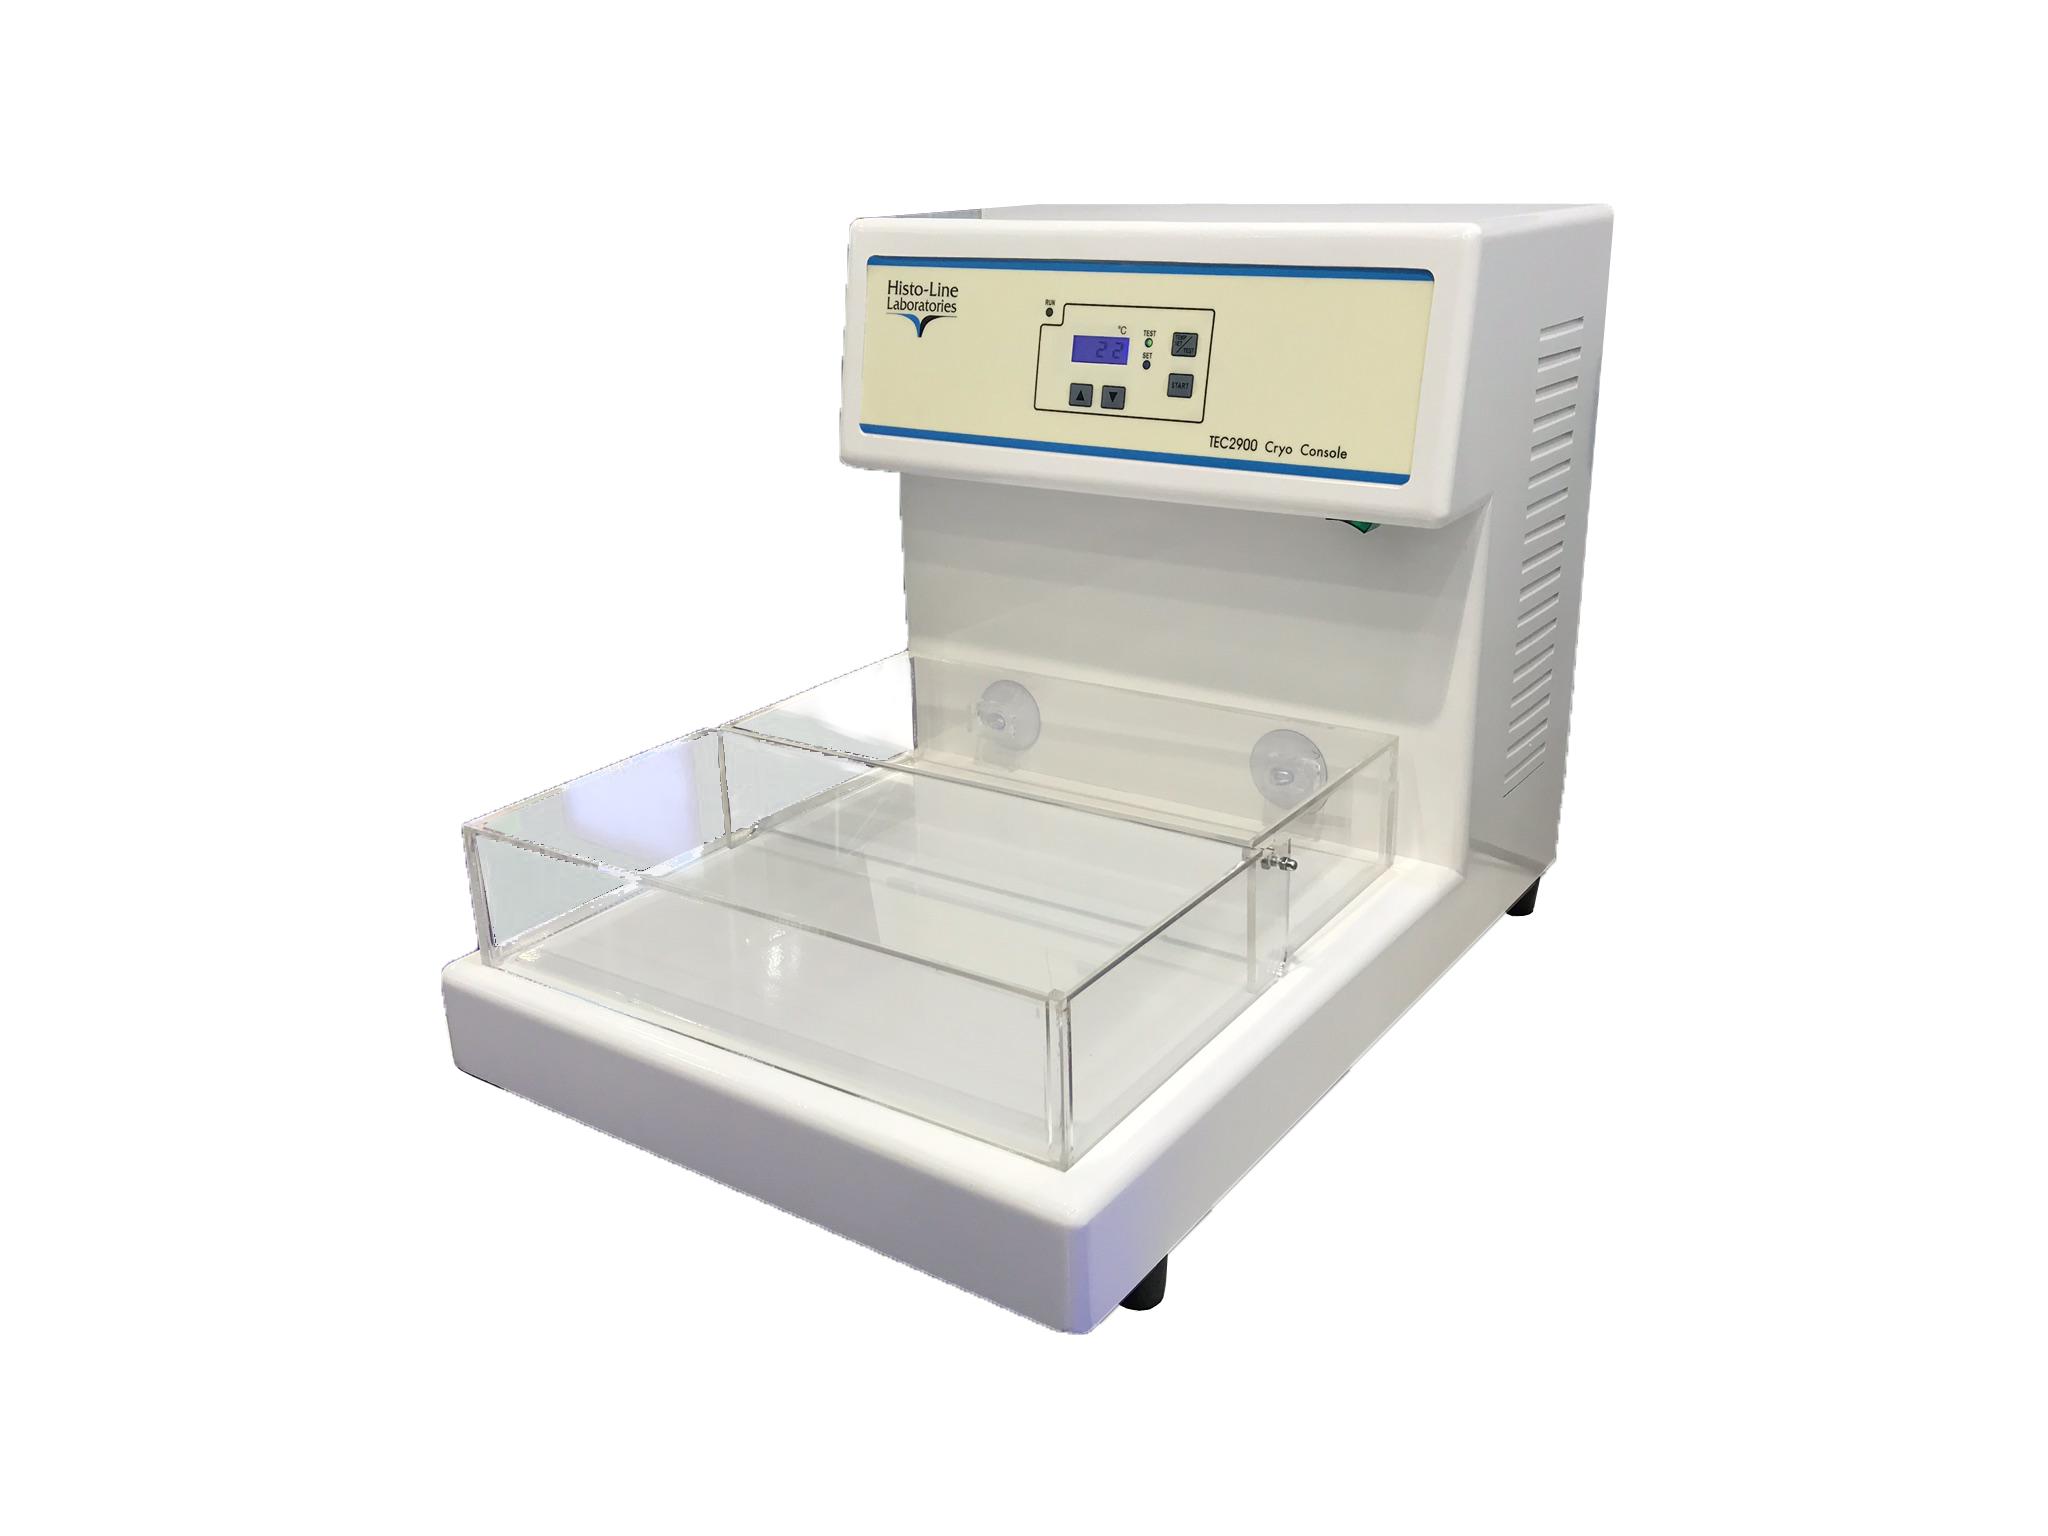 TEC2900-2 | Histoline